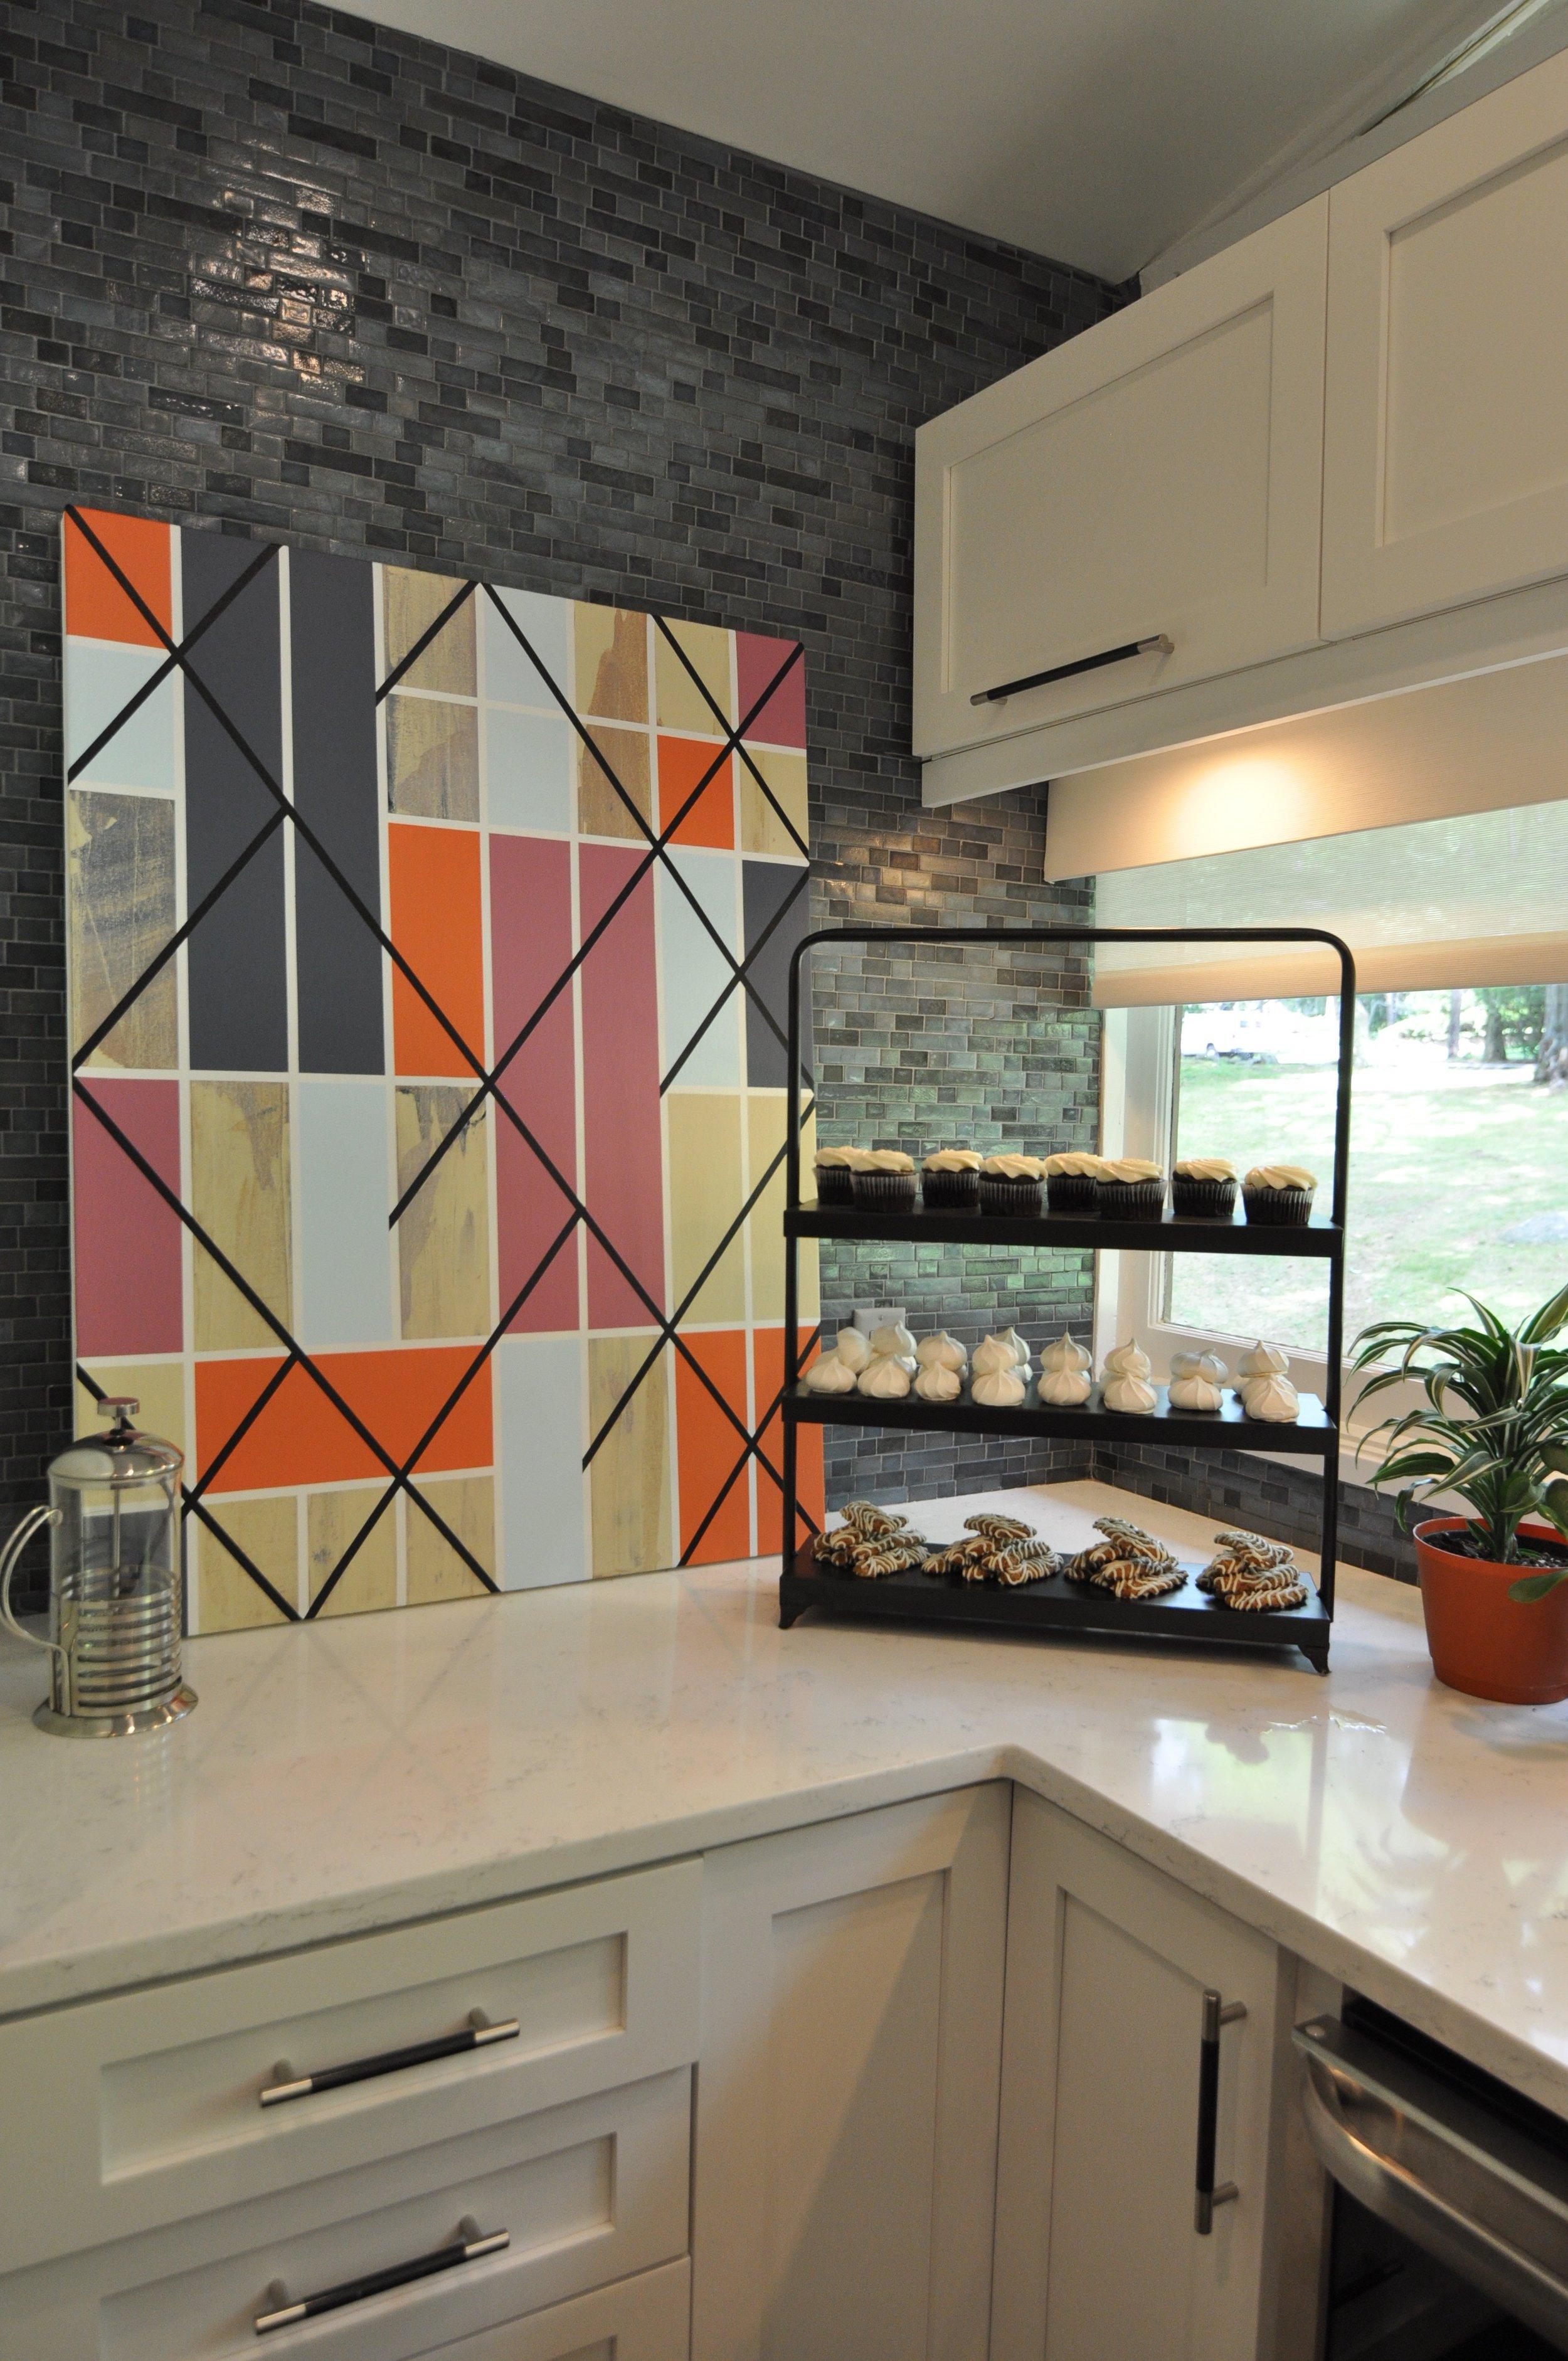 Kim A Mitchell_Design Lead_HGTV_The Property Brothers_Season 6_Episode 9_Close-up Glass Tile Backsplash_Art_Staging_2017.jpg